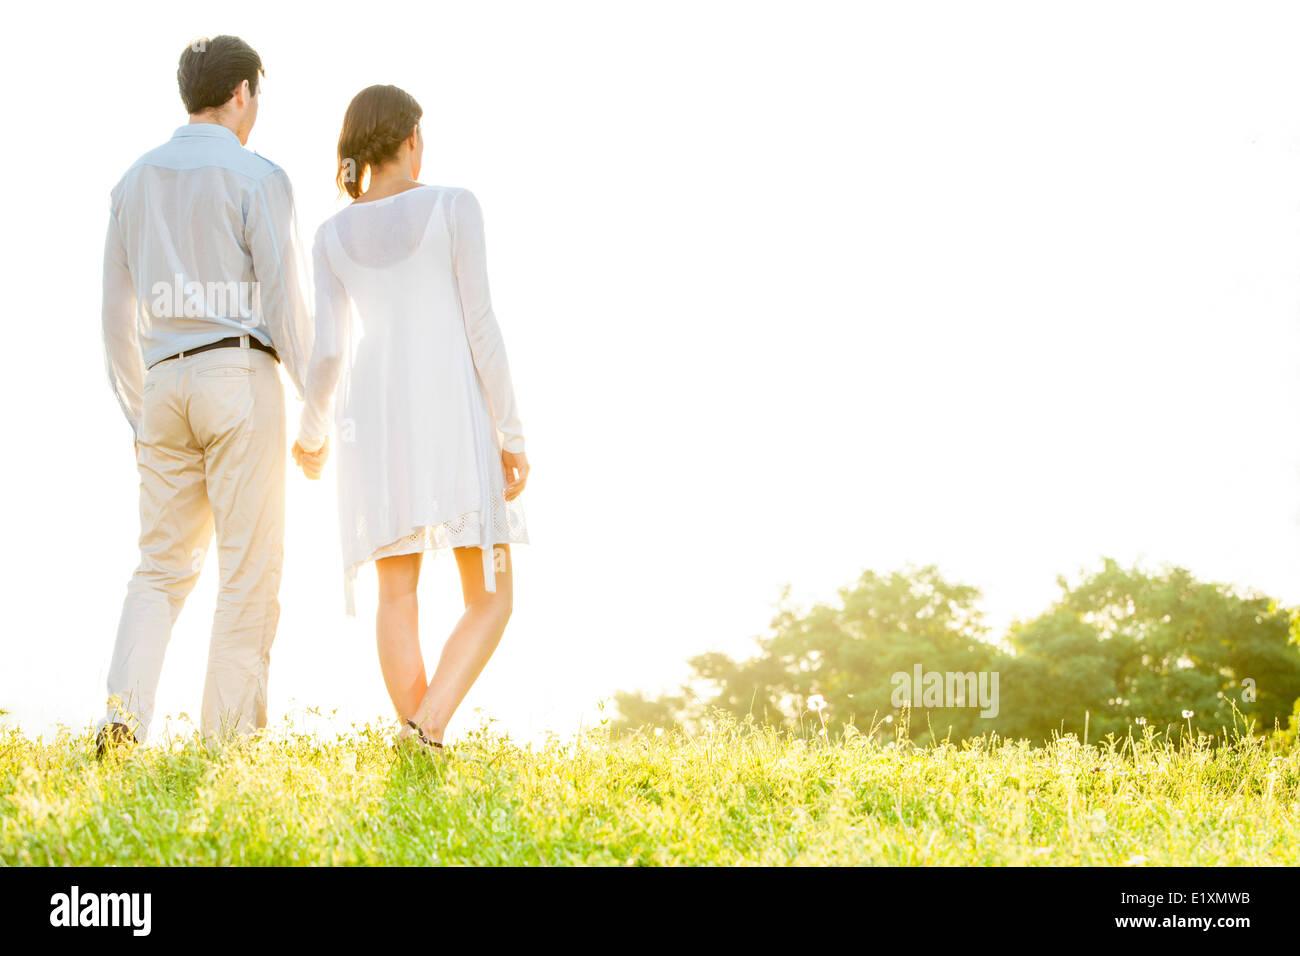 Rückansicht des junges Paar Hand in Hand im Park gegen klaren Himmel Stockbild